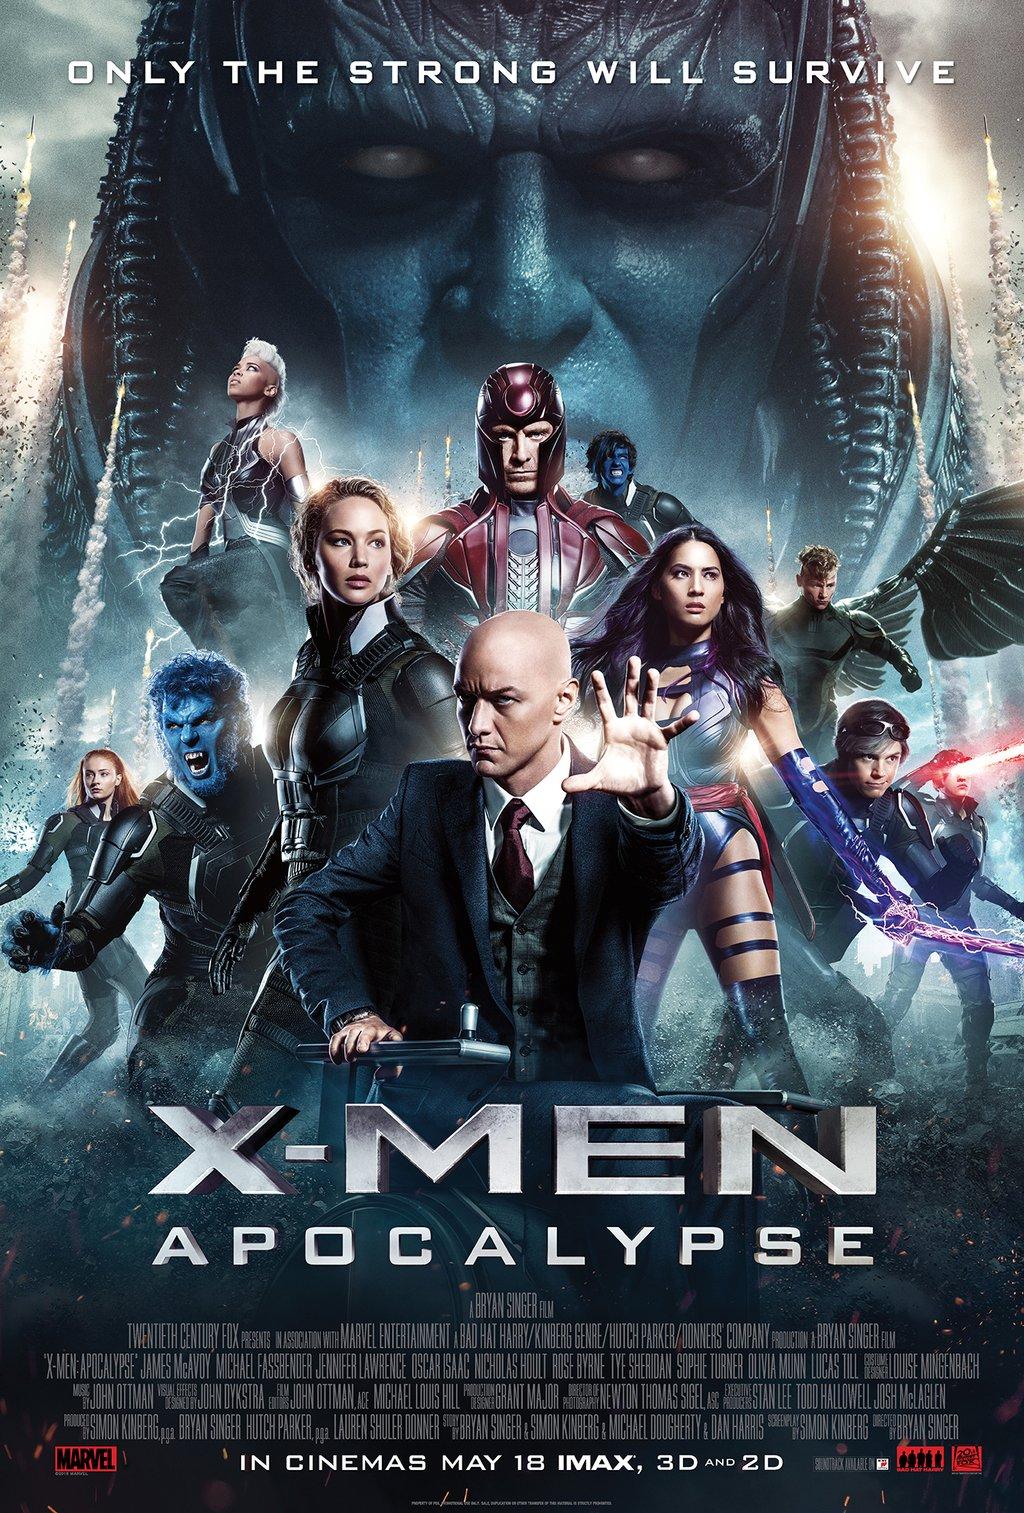 XMen Apocalypse